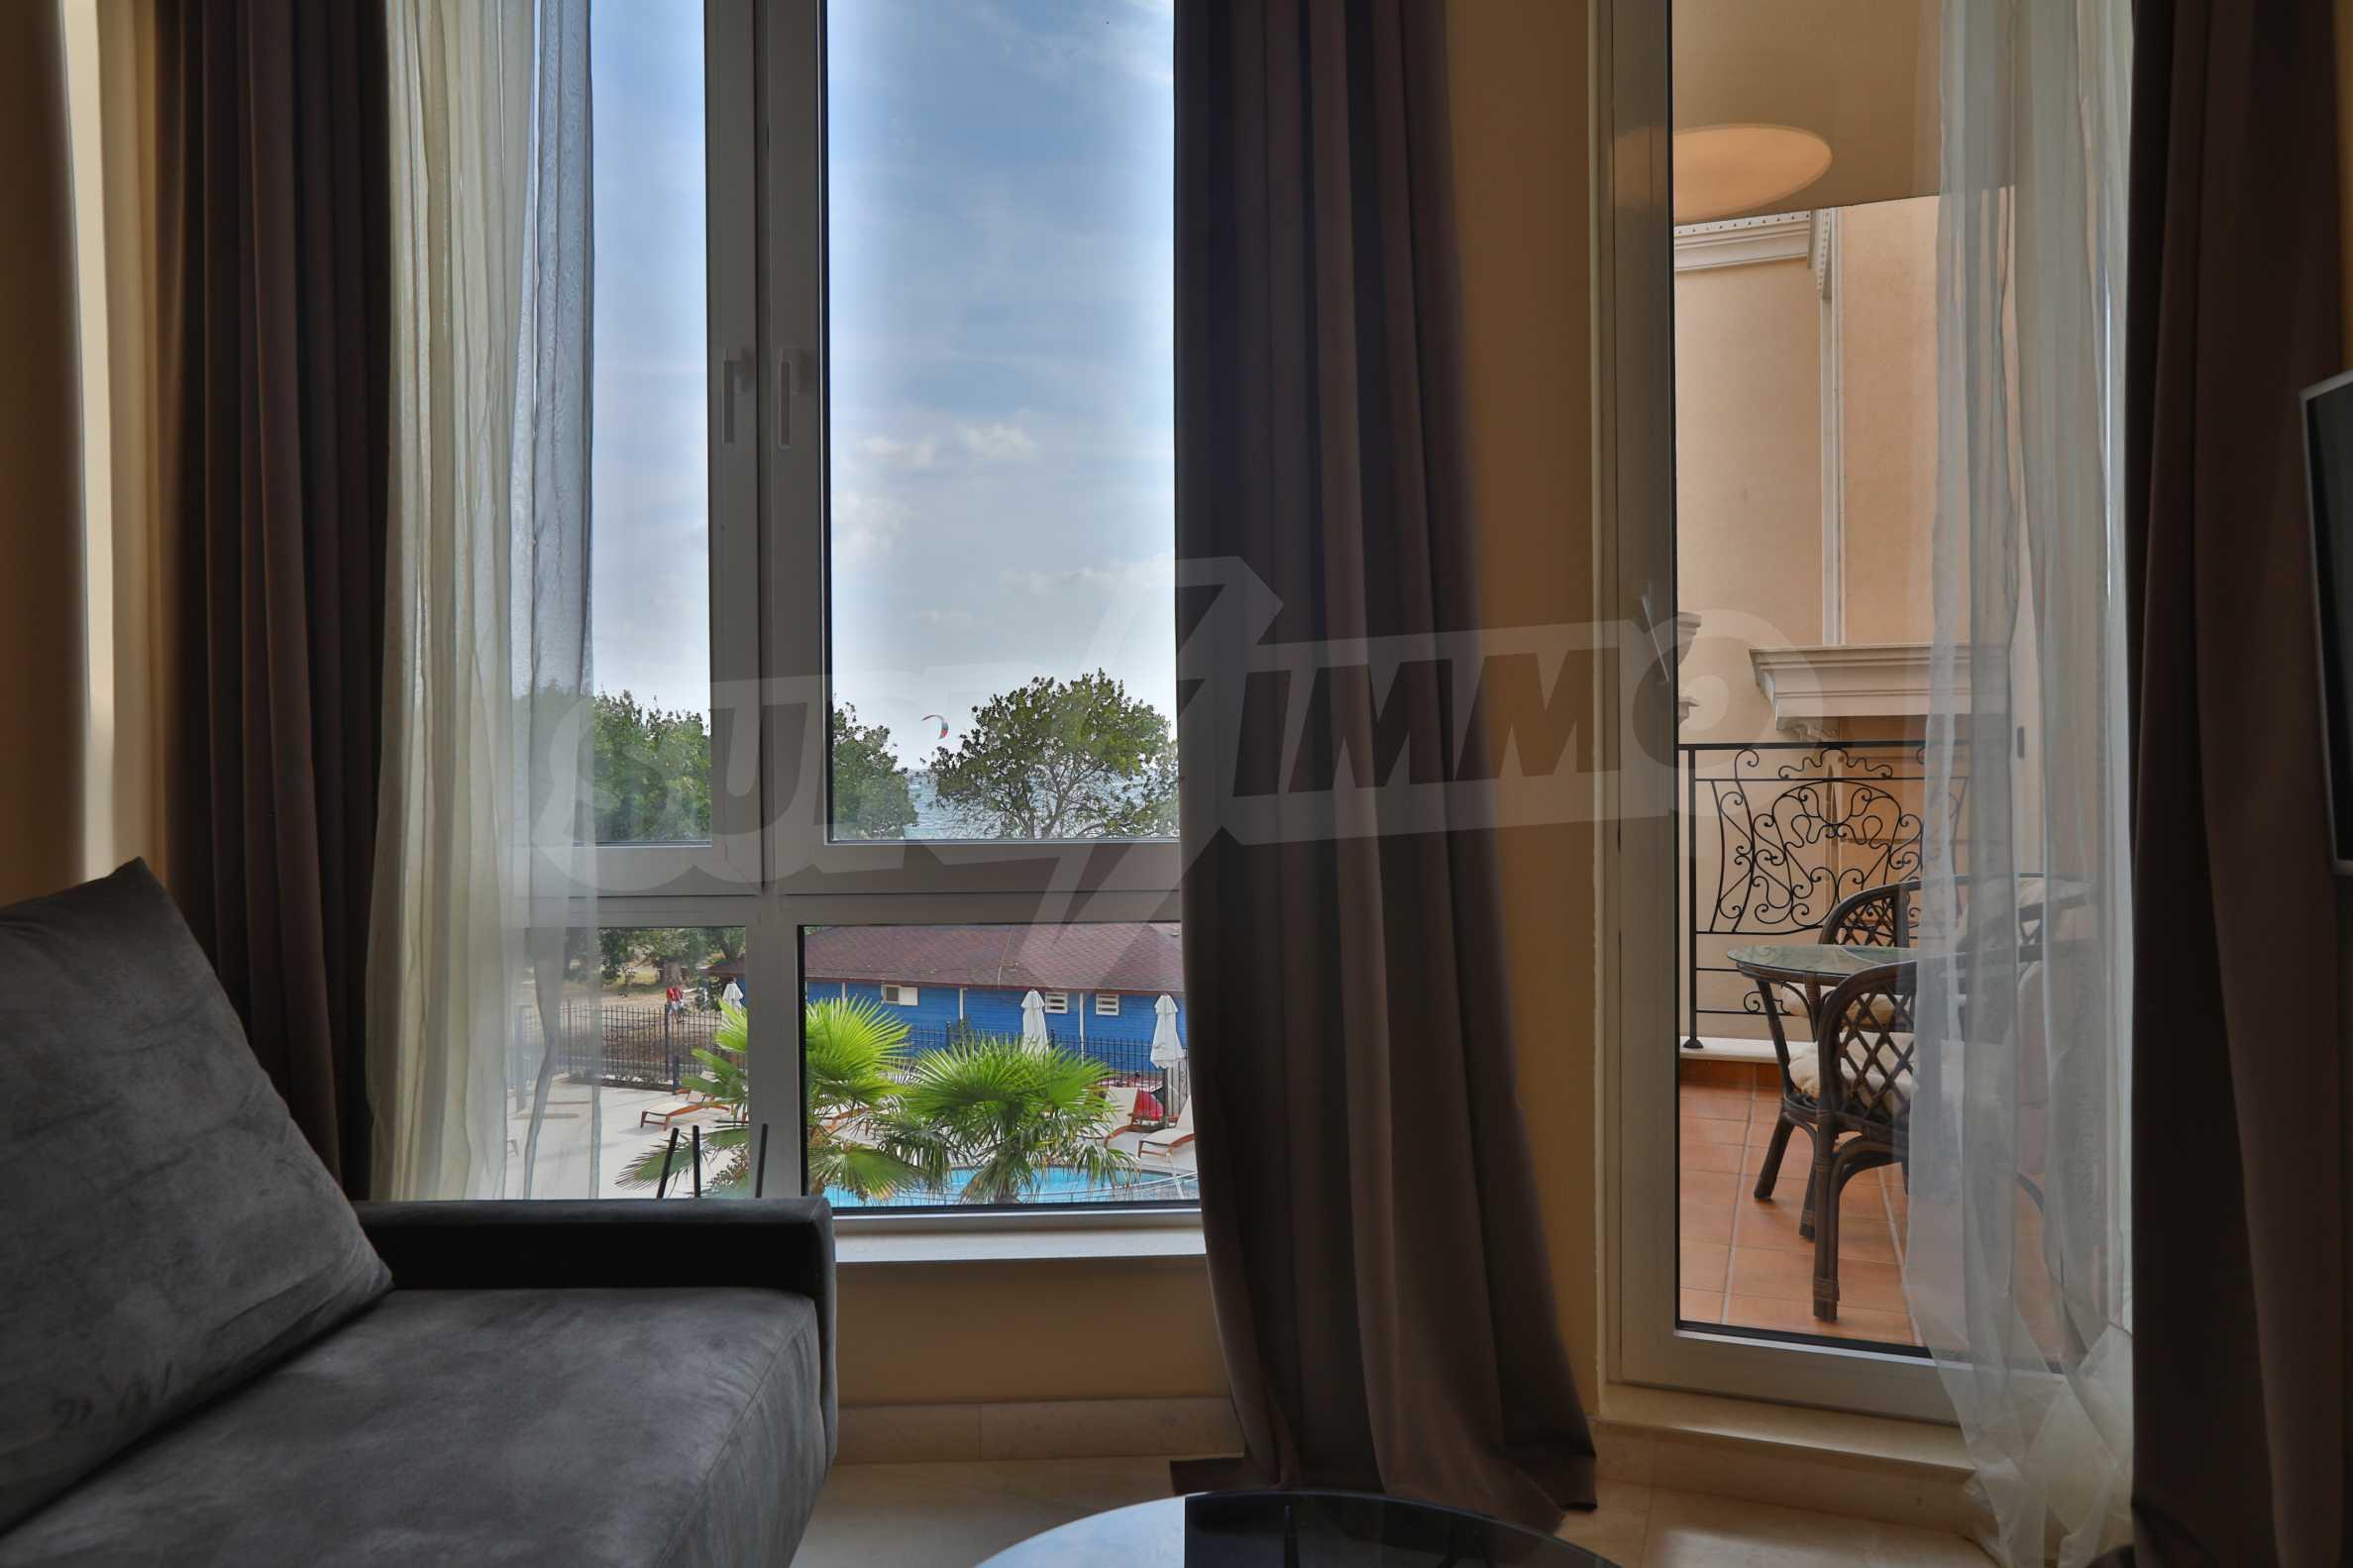 Exclusive 2-bedroom beachfront apartment in the prestigious Belle Époque Beach Residence 8